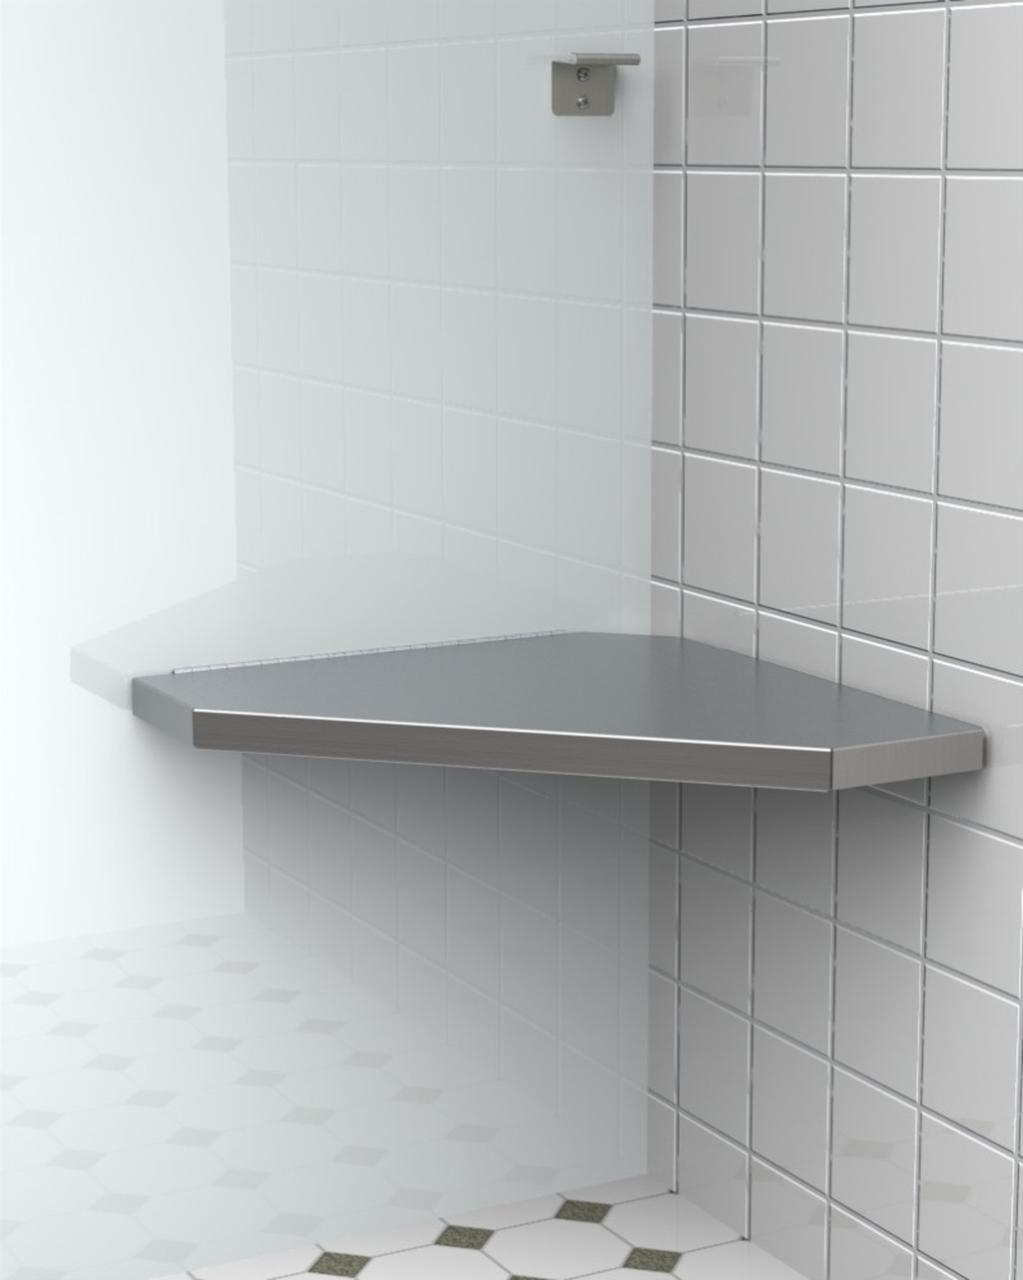 installation of a corner shower seat